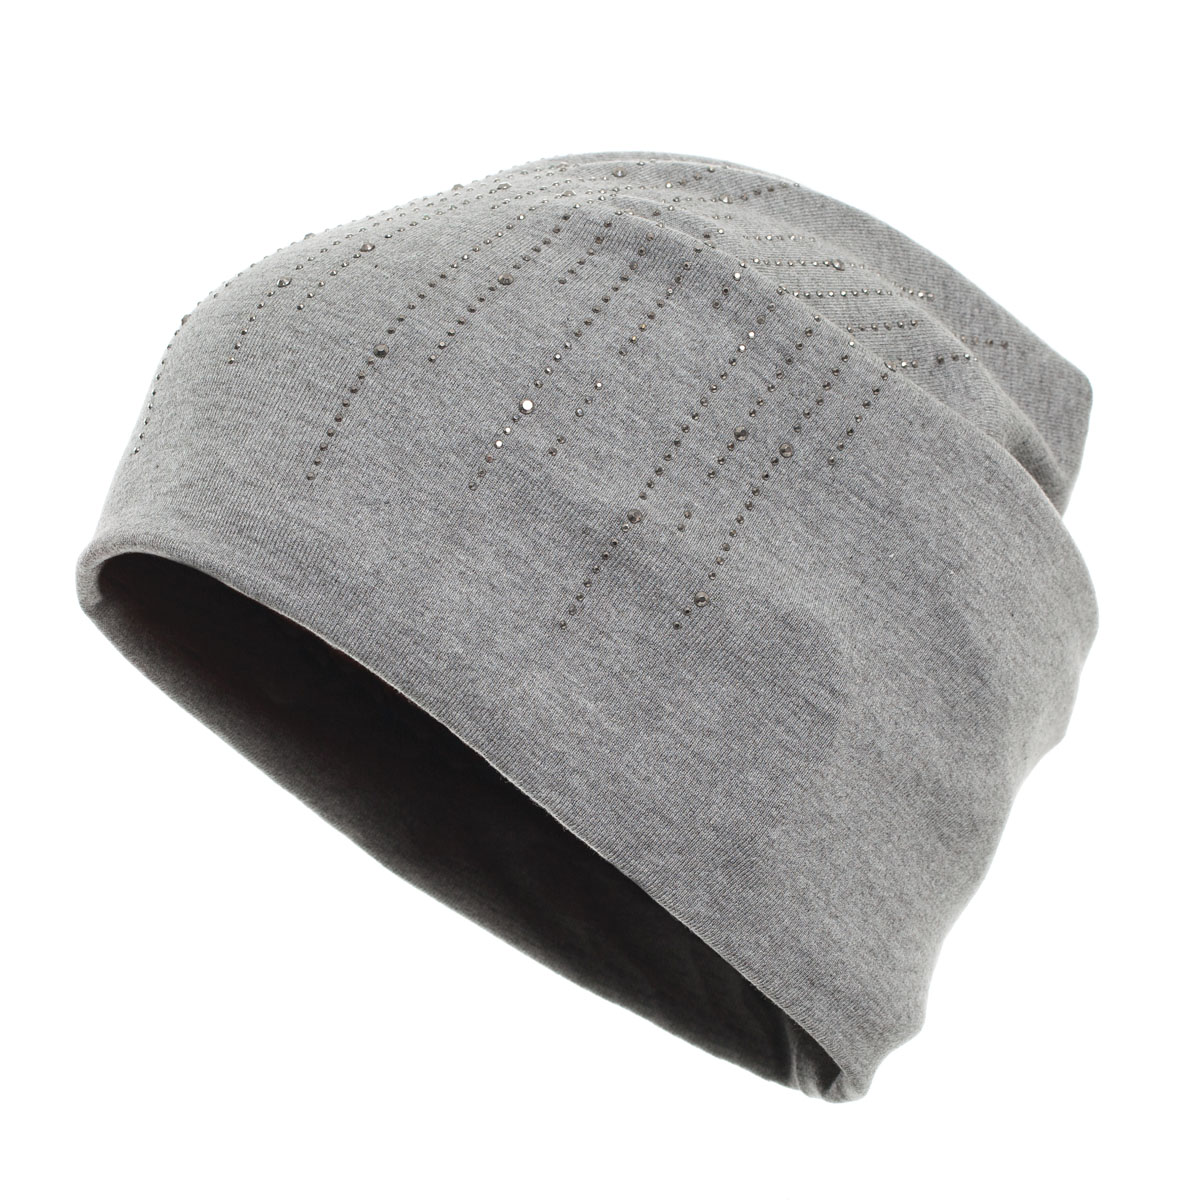 Шапка Sevenext, 39059-7 шапка sevenext 39059 7